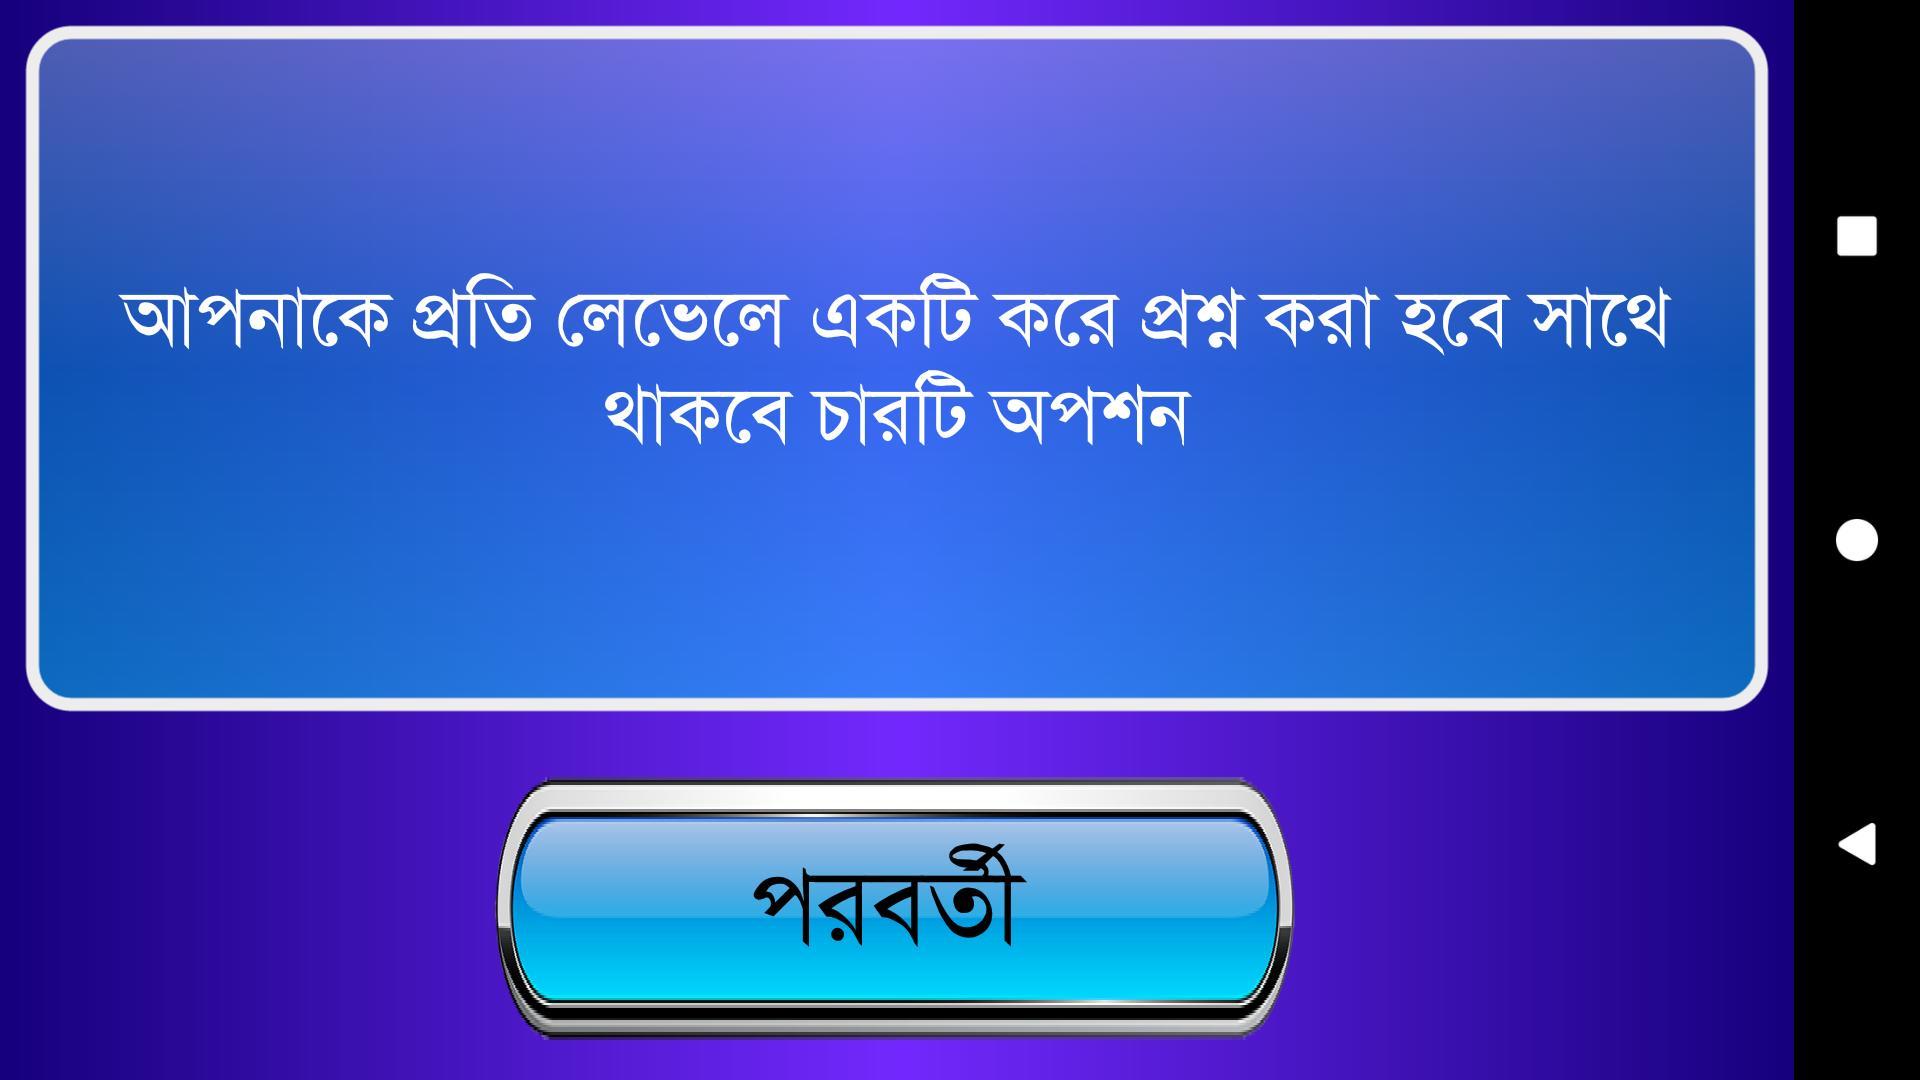 KBC Bangladesh for Android - APK Download